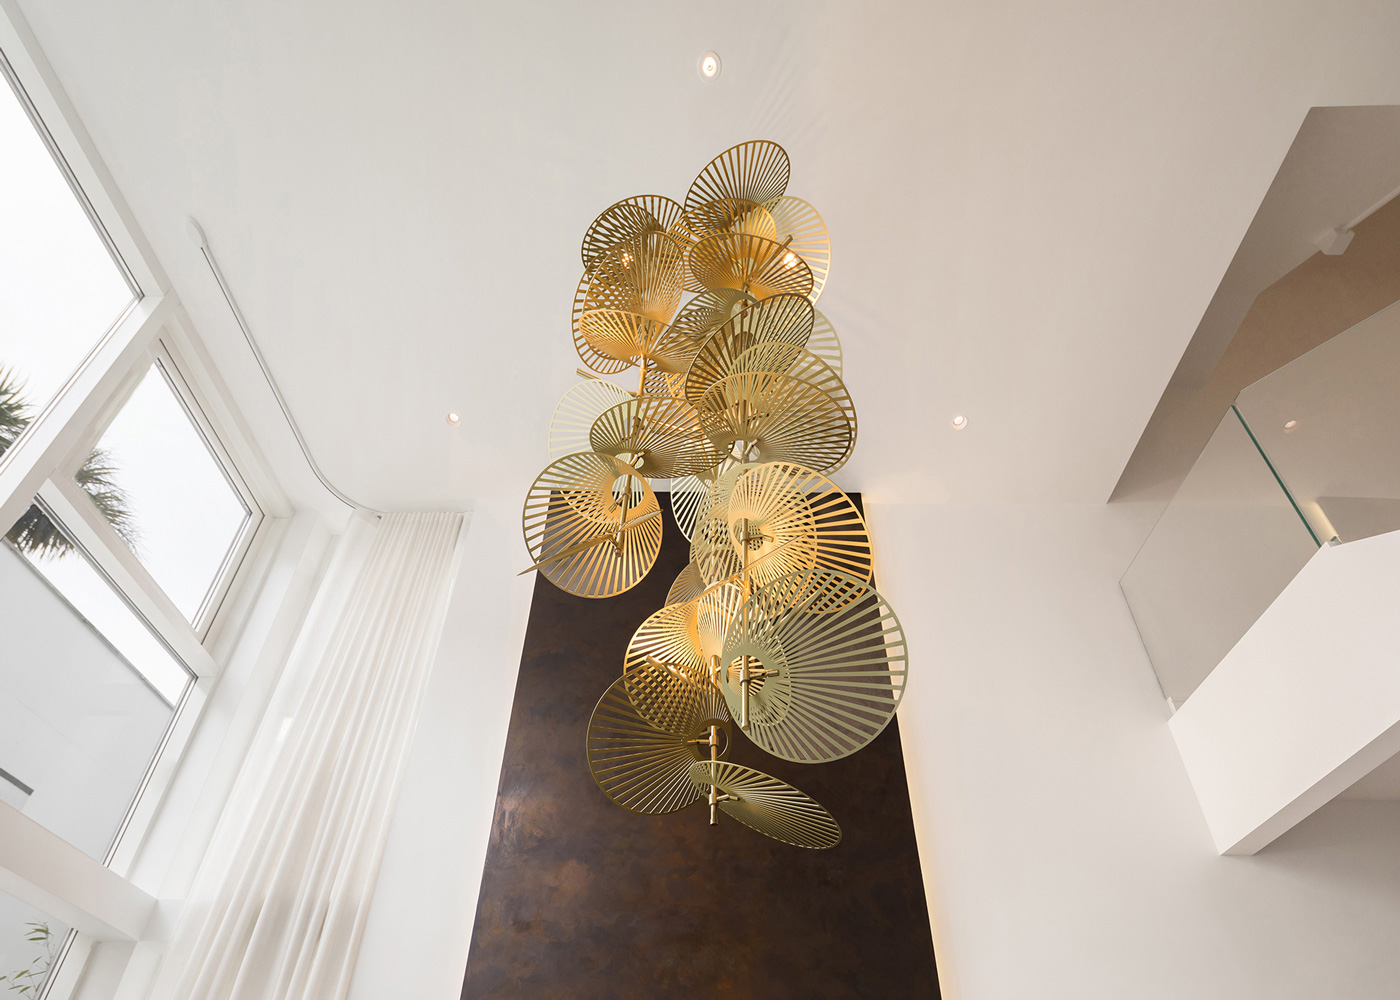 Upshot-Leaf-Residential-Installation